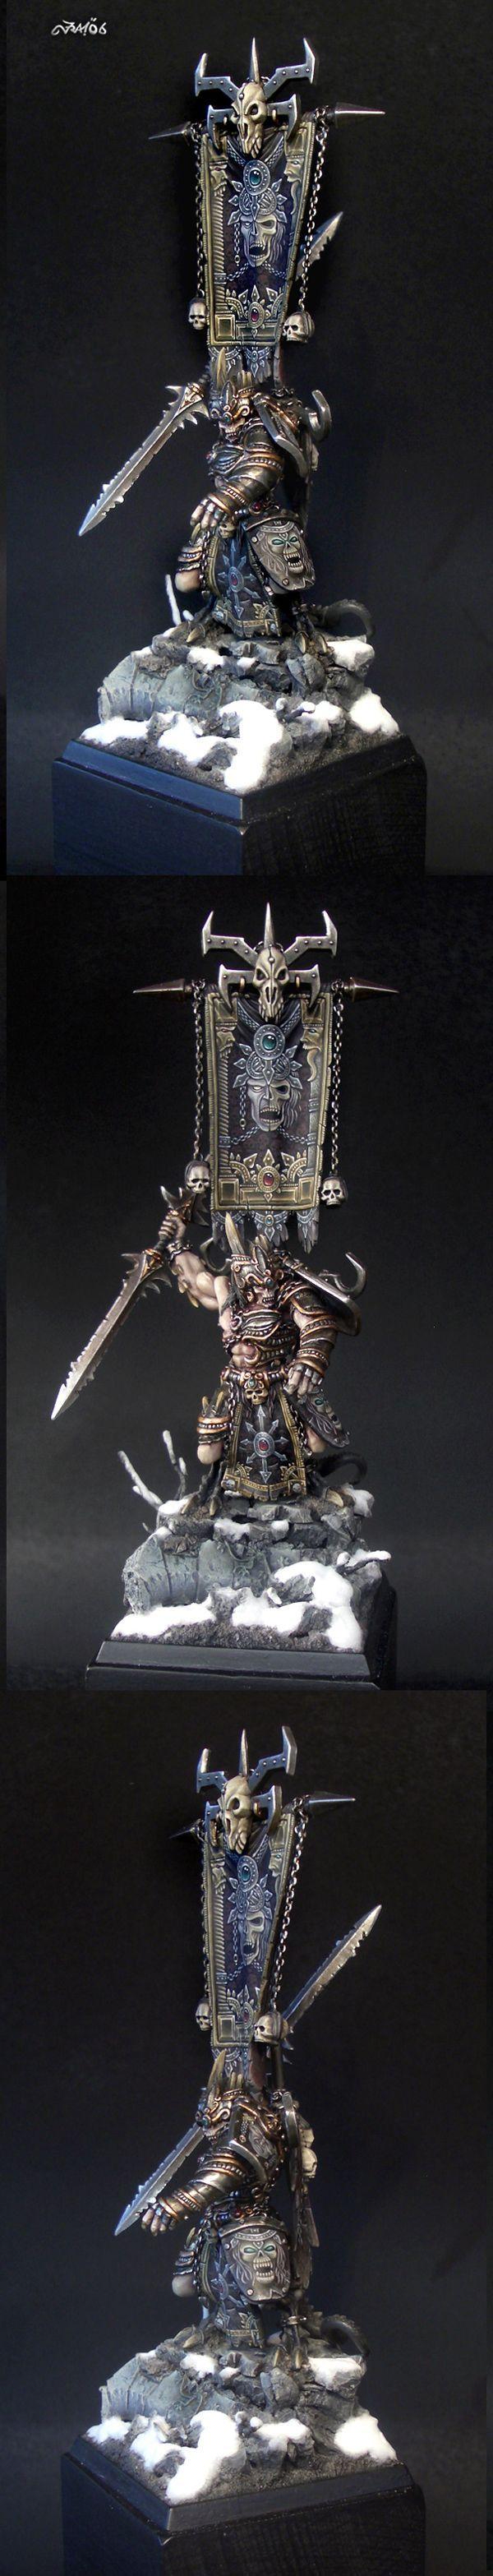 Antarlatoteph, the dark ancient – Demon Prince